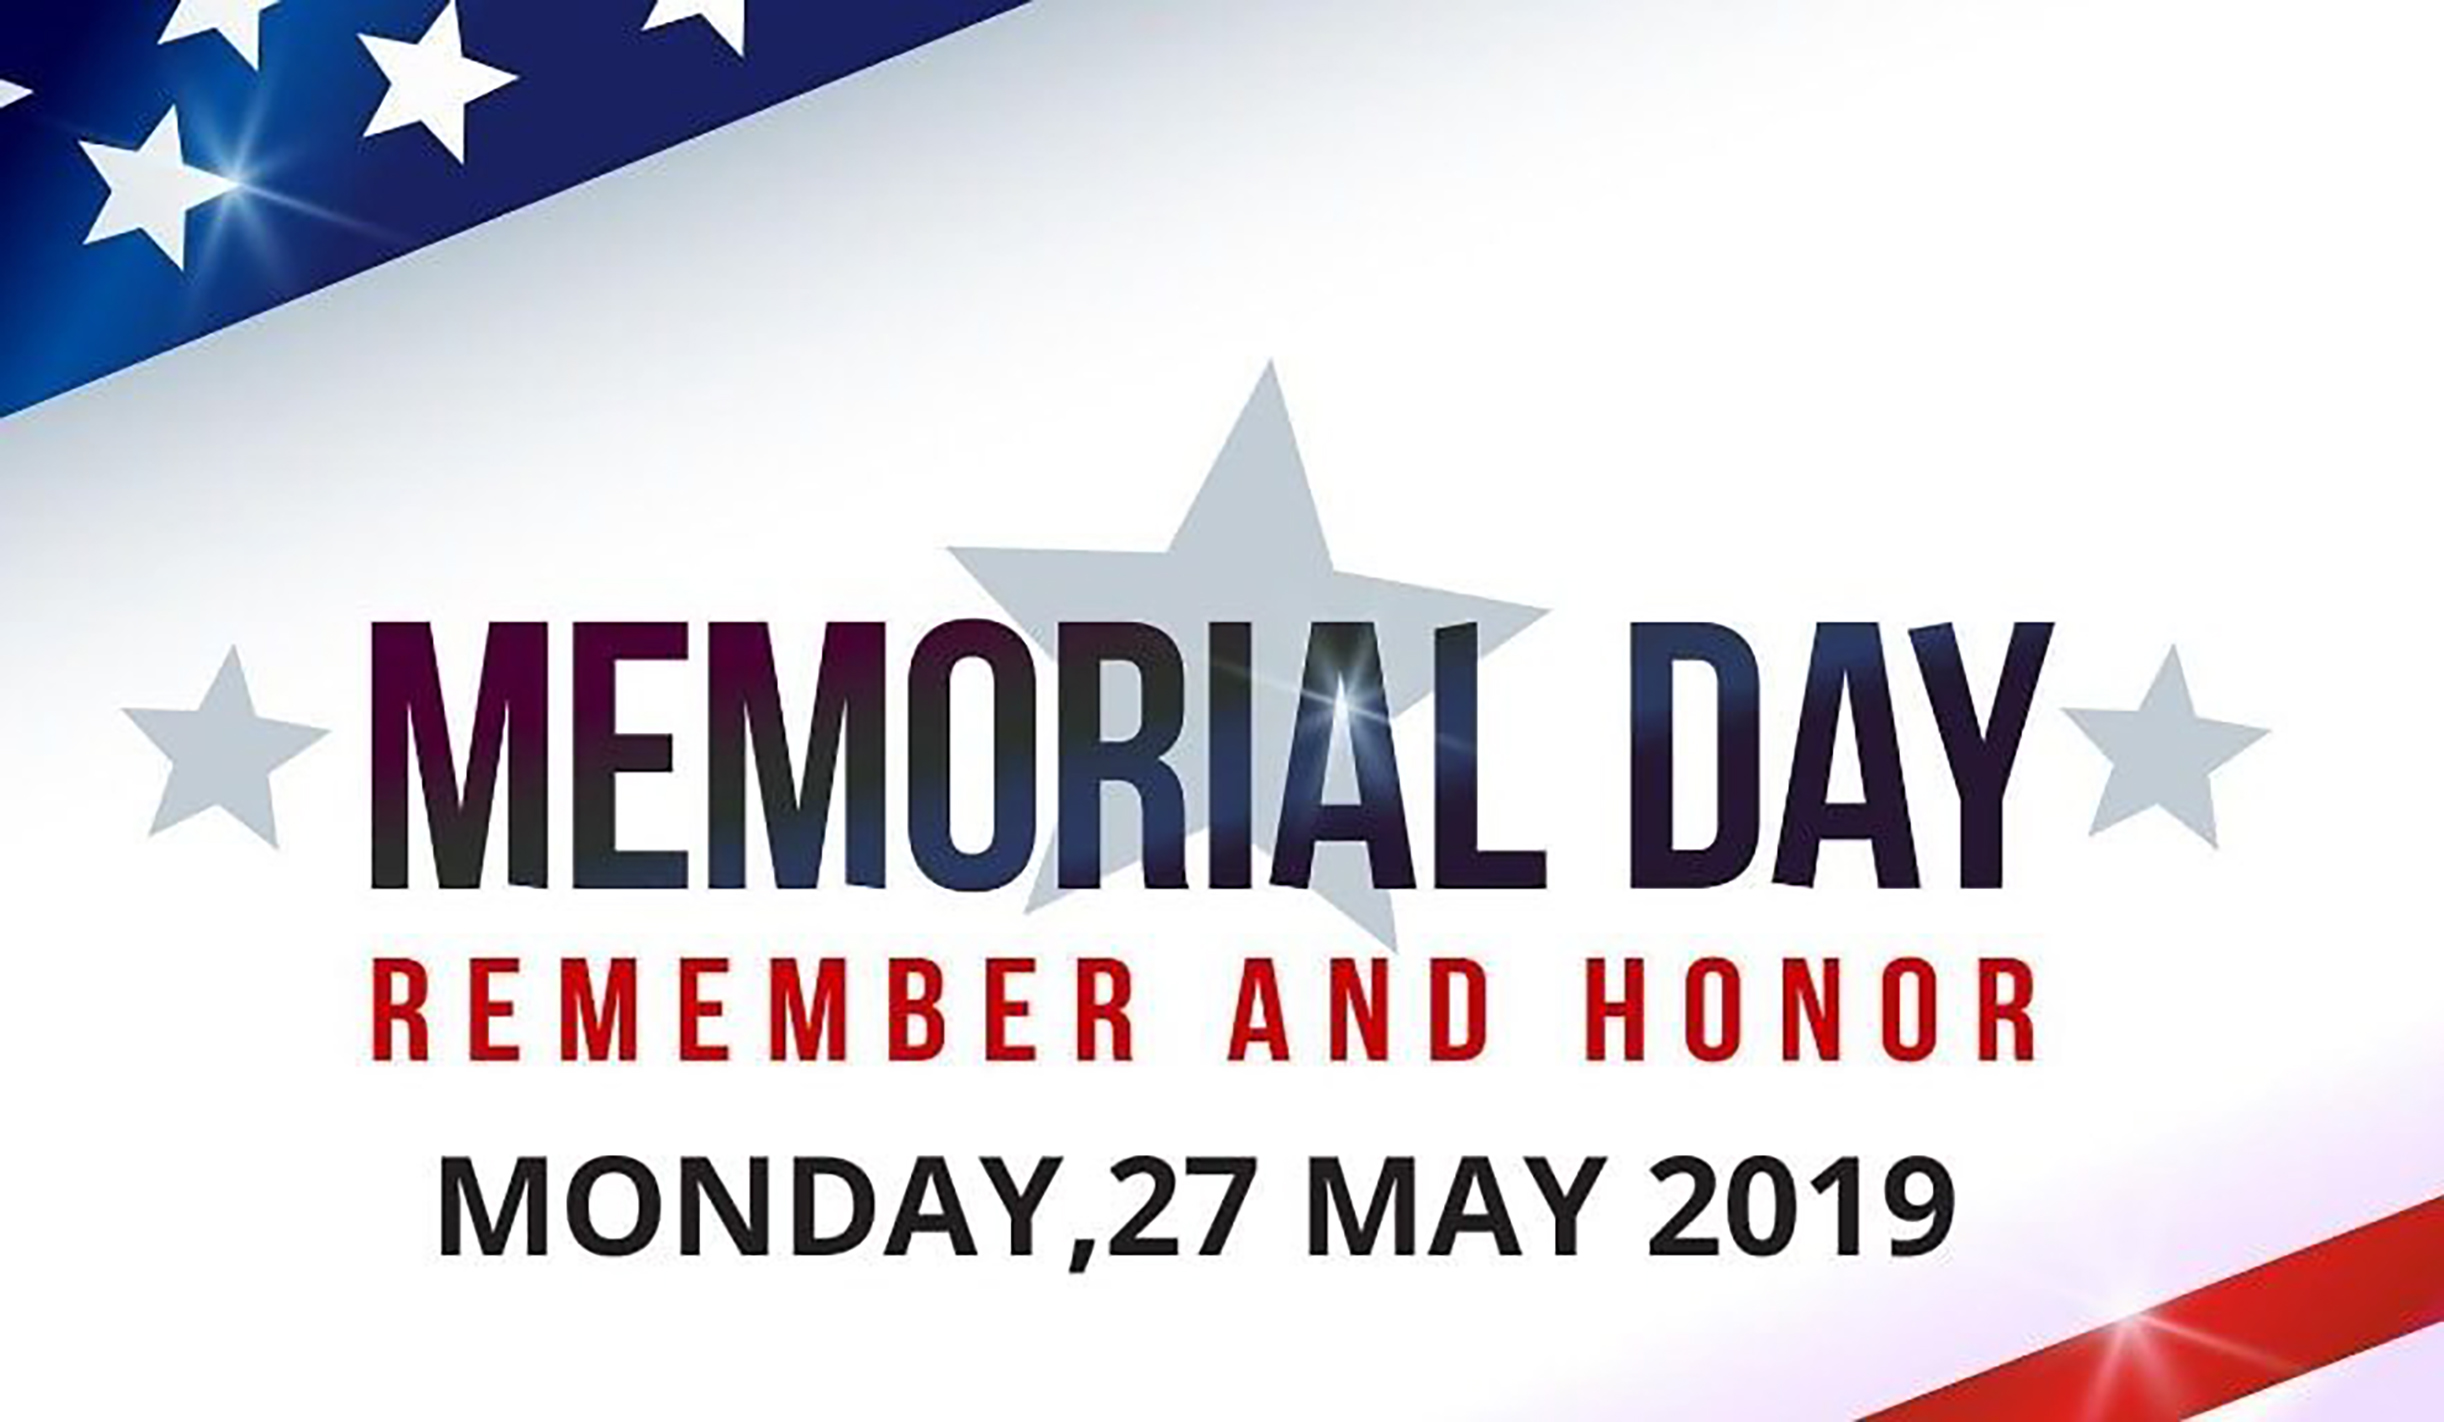 Happy-Memorial-day-2019-880x512.jpg